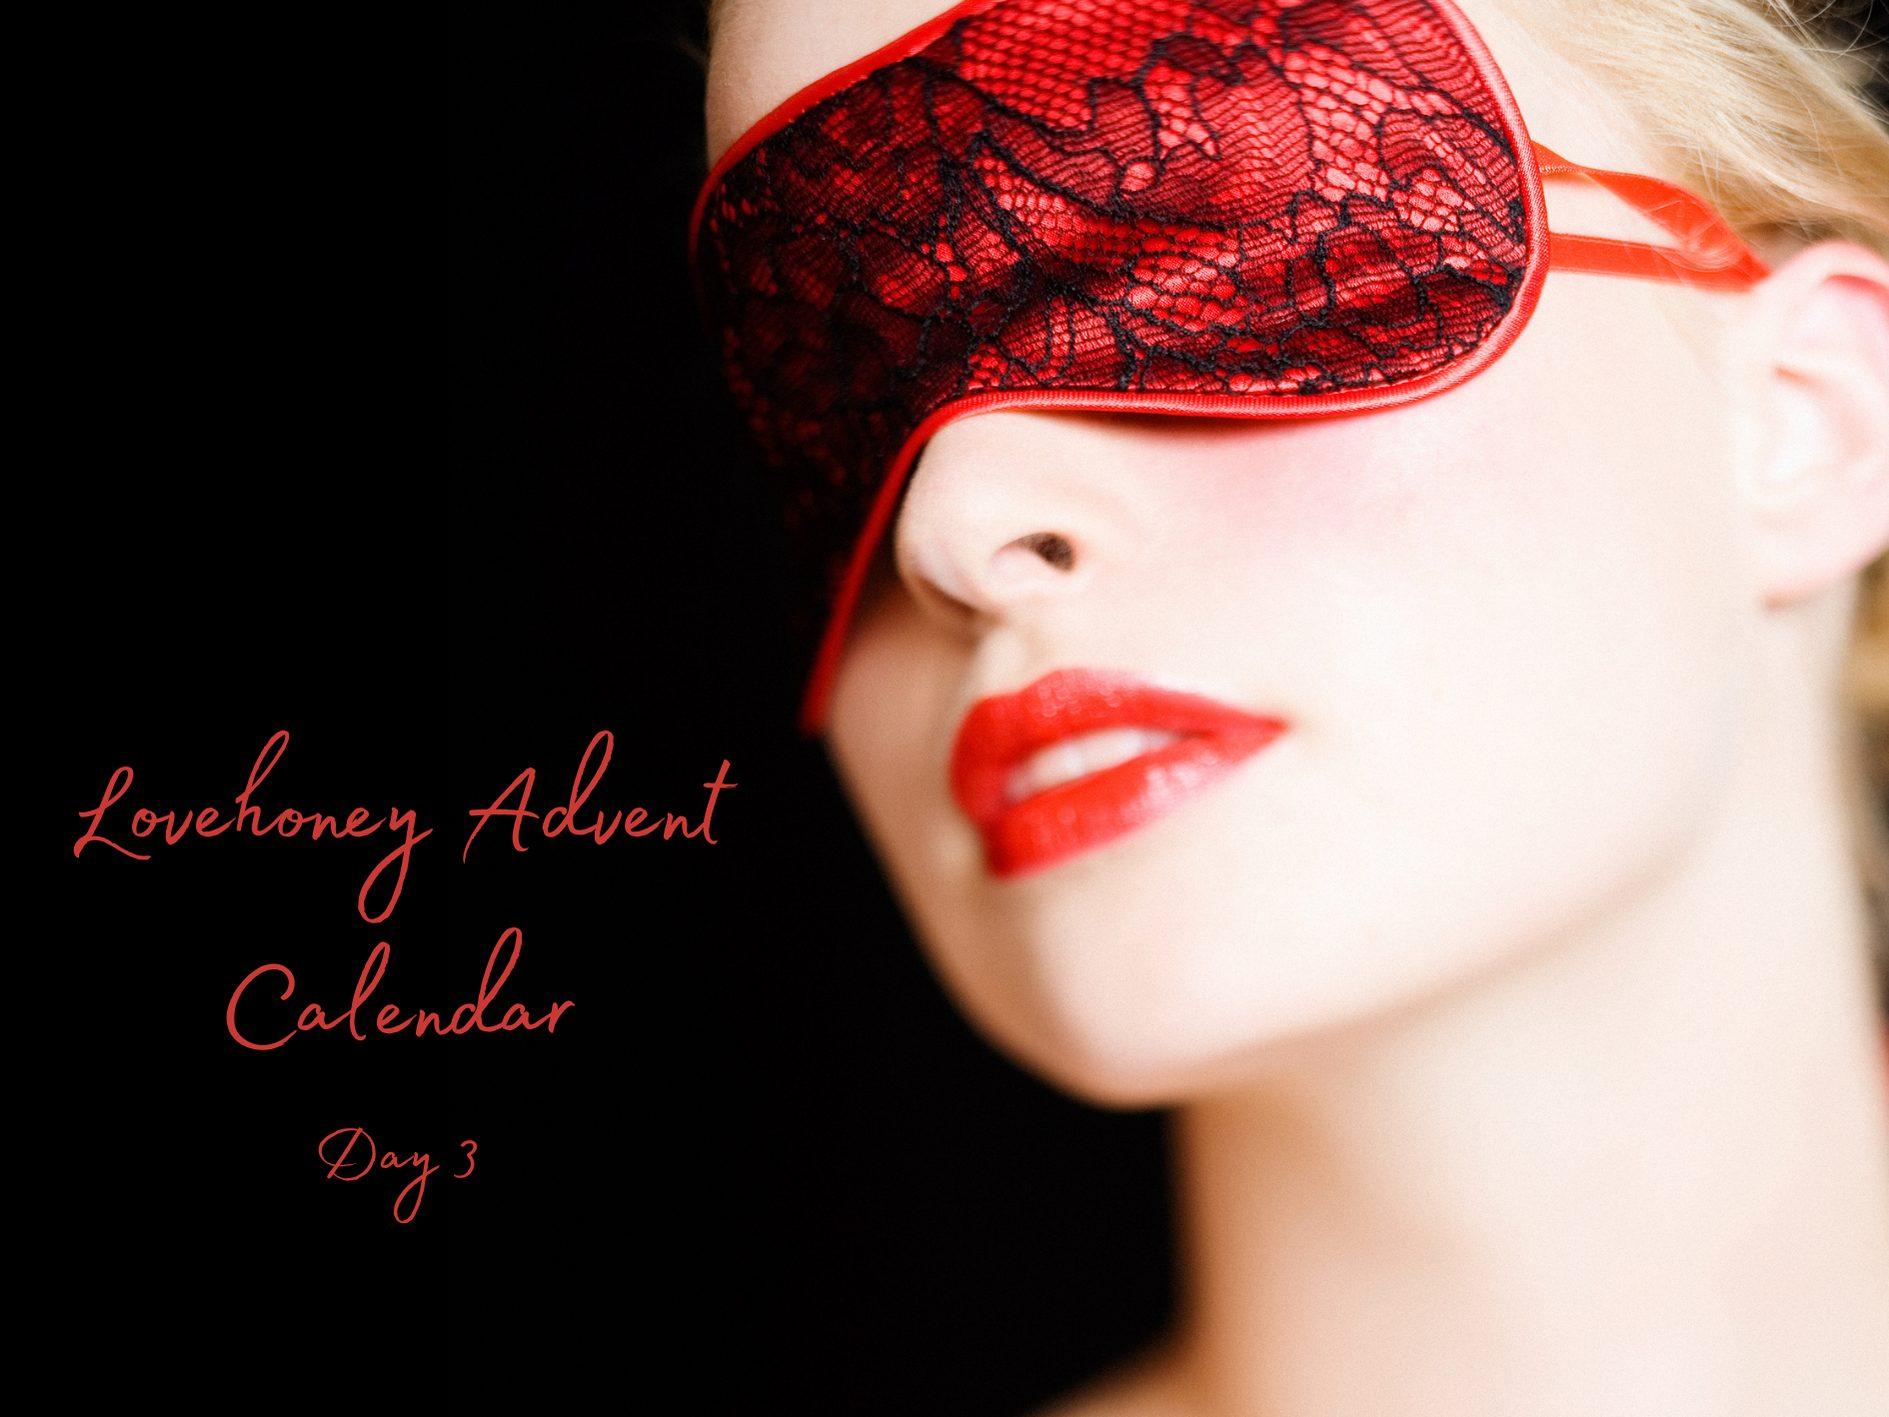 Lovehoney Sex Toy Advent Calendar Door #3: Starry Eyed Blindfold